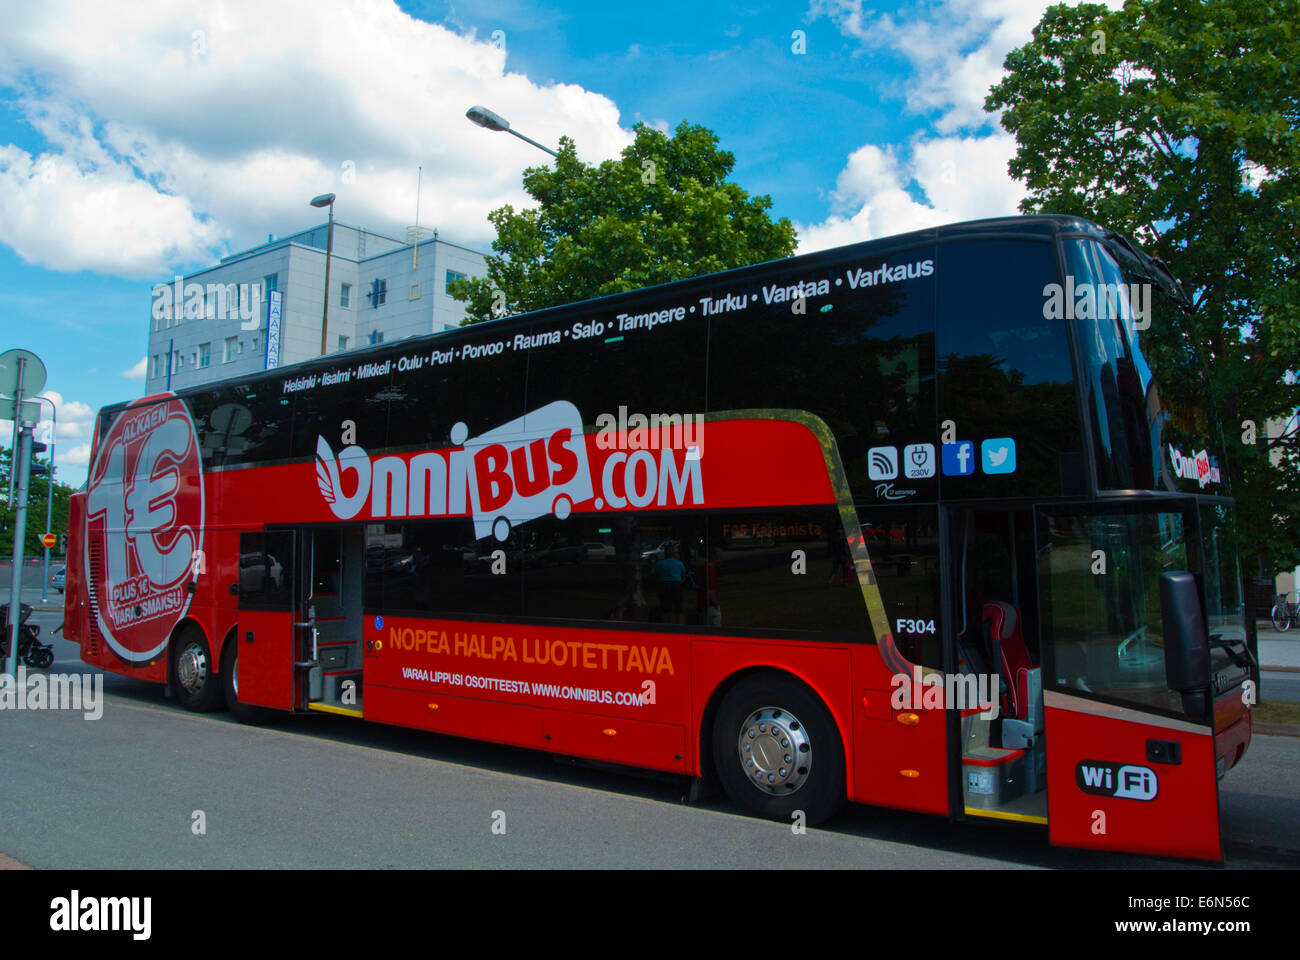 Onnibus, no frills long distance bus, Pori, Finland, Europe - Stock Image